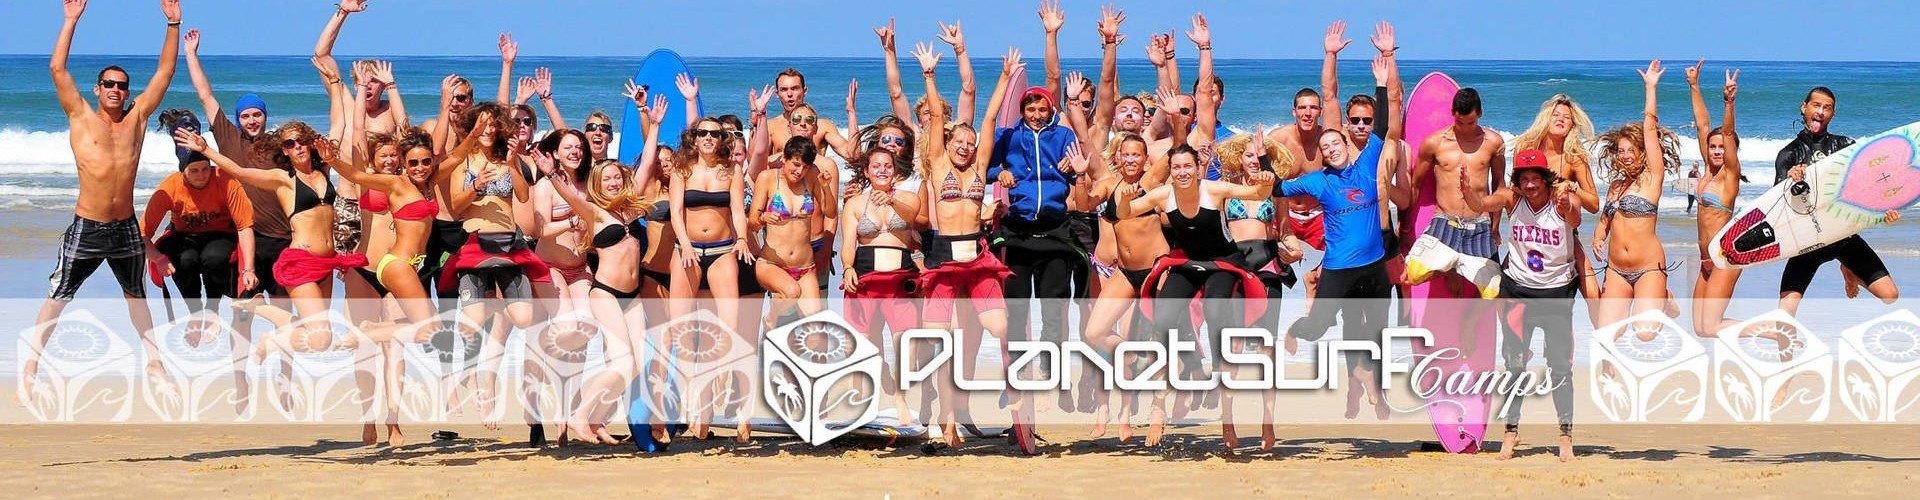 Planet Surfcamps natürlich Menschen in Le Pin Sec Strand